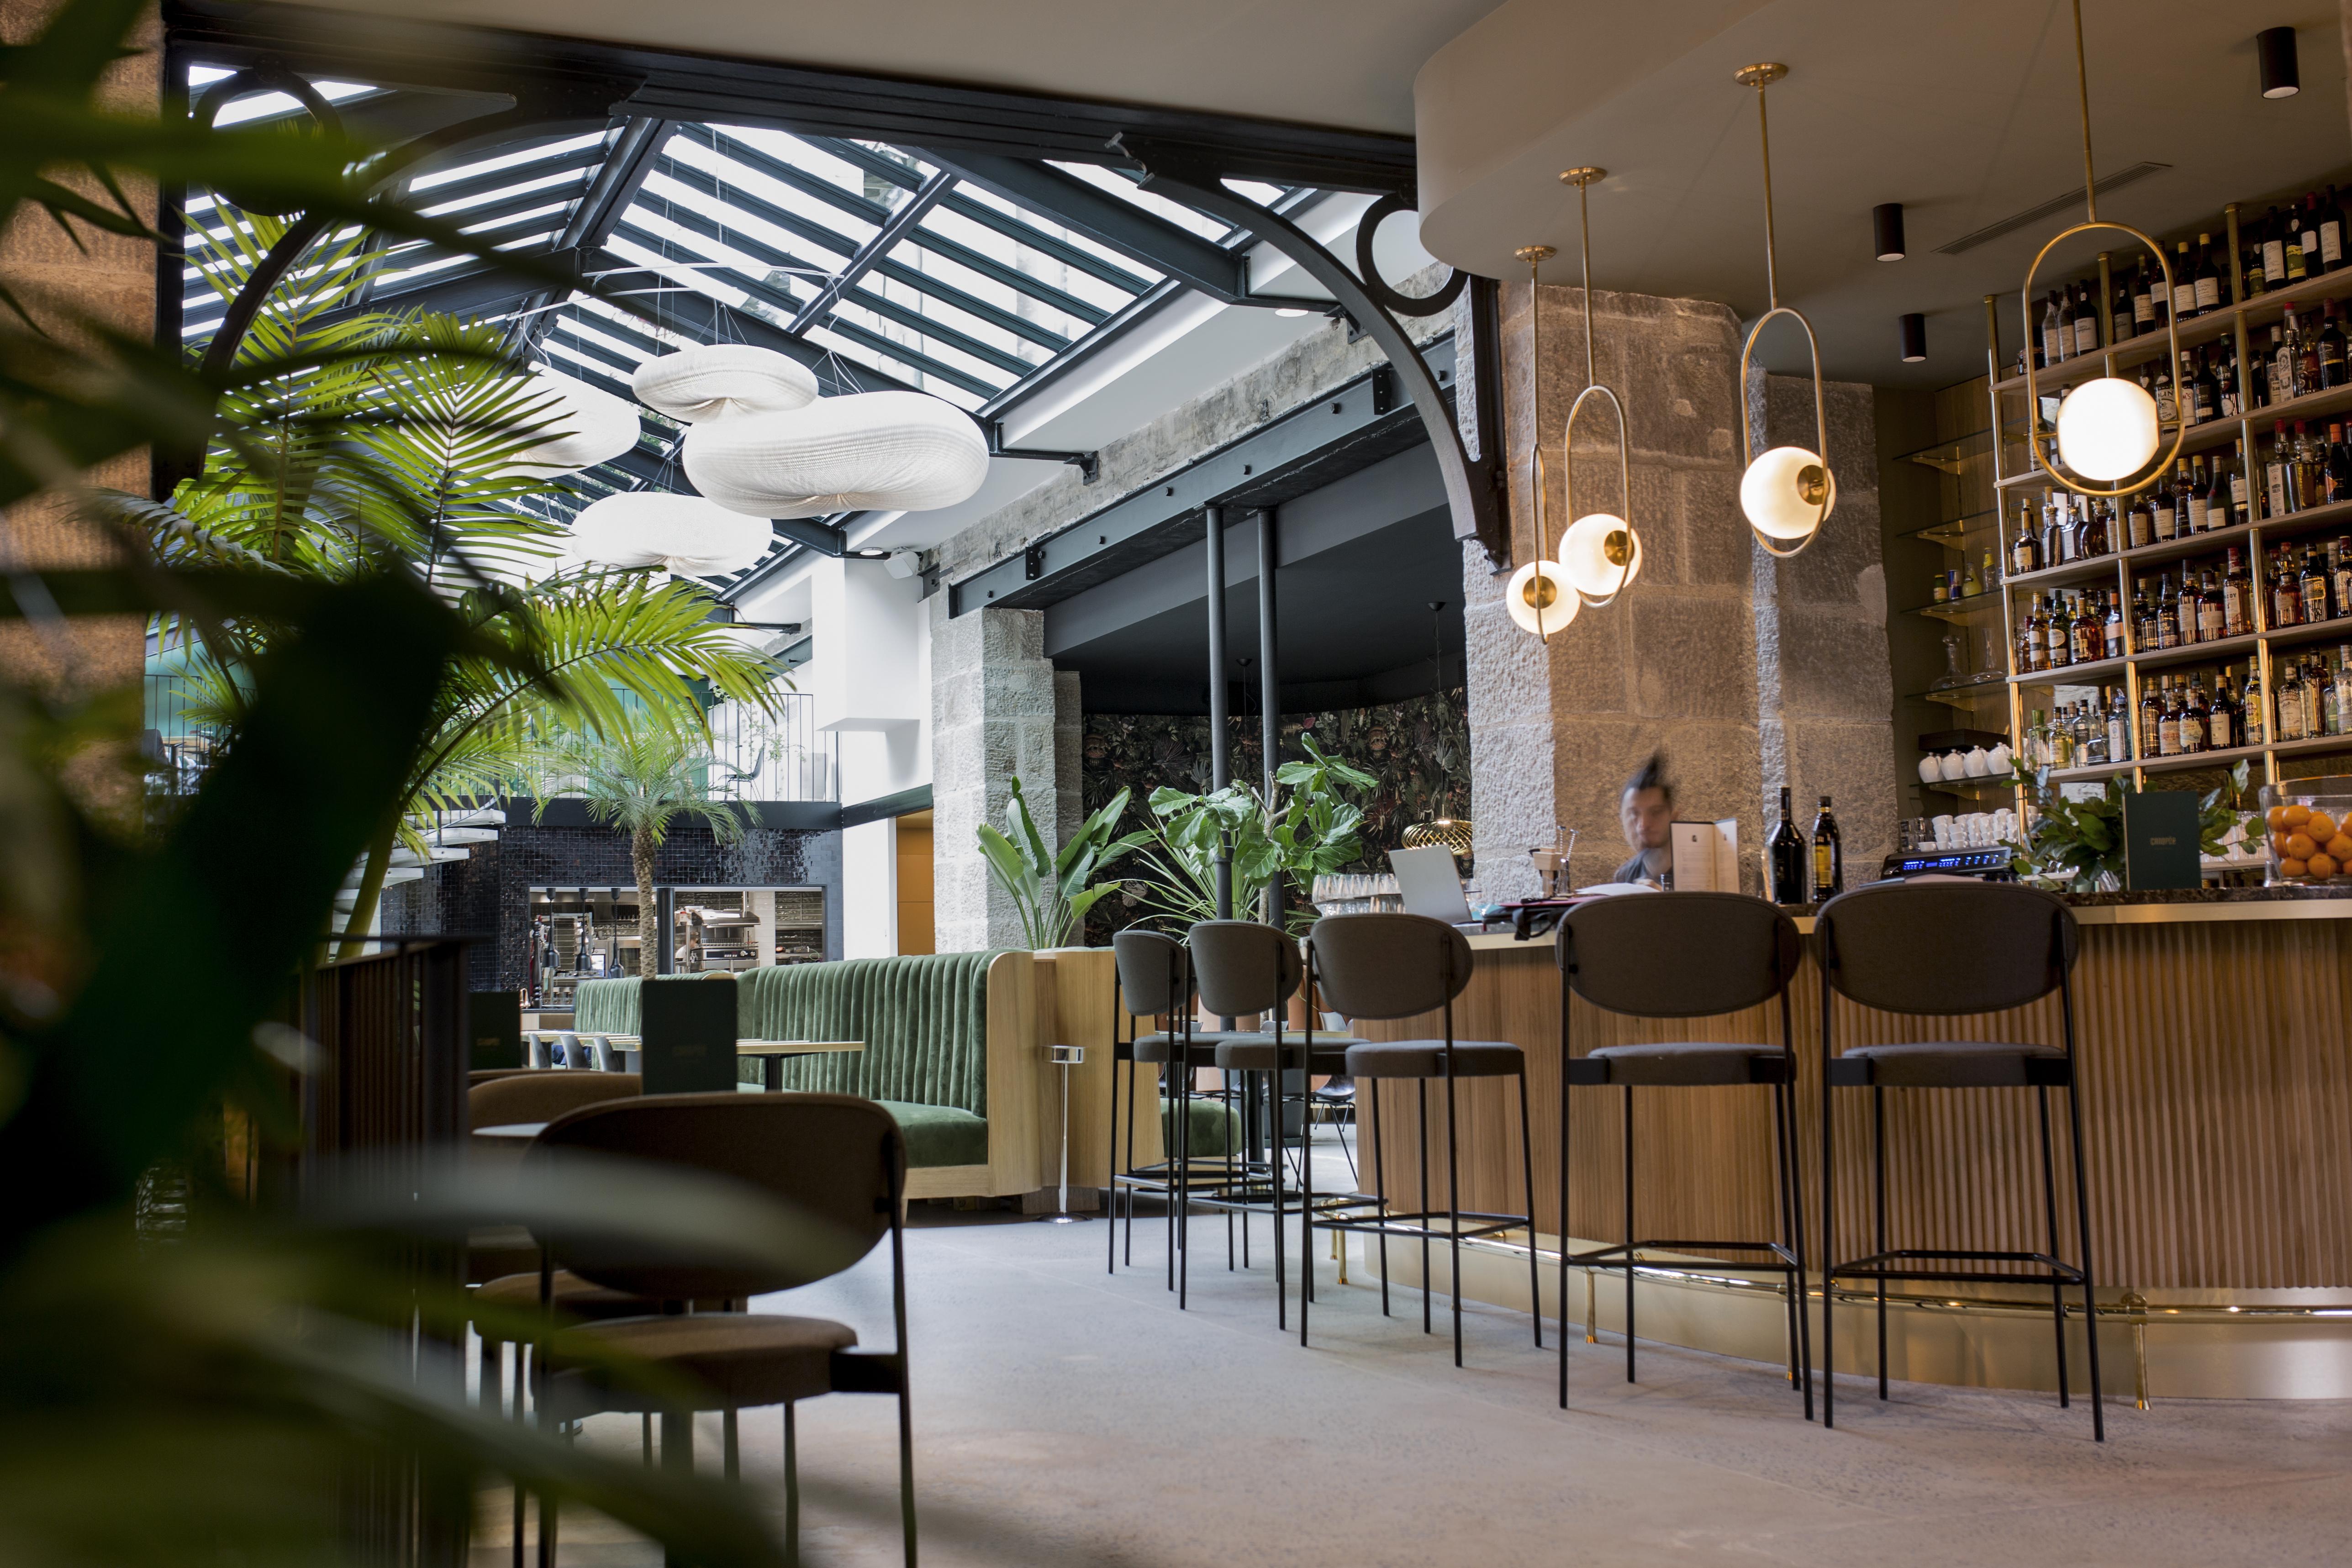 Restaurant-Luxe-Design-Graphique-Nantes-Canopee-2